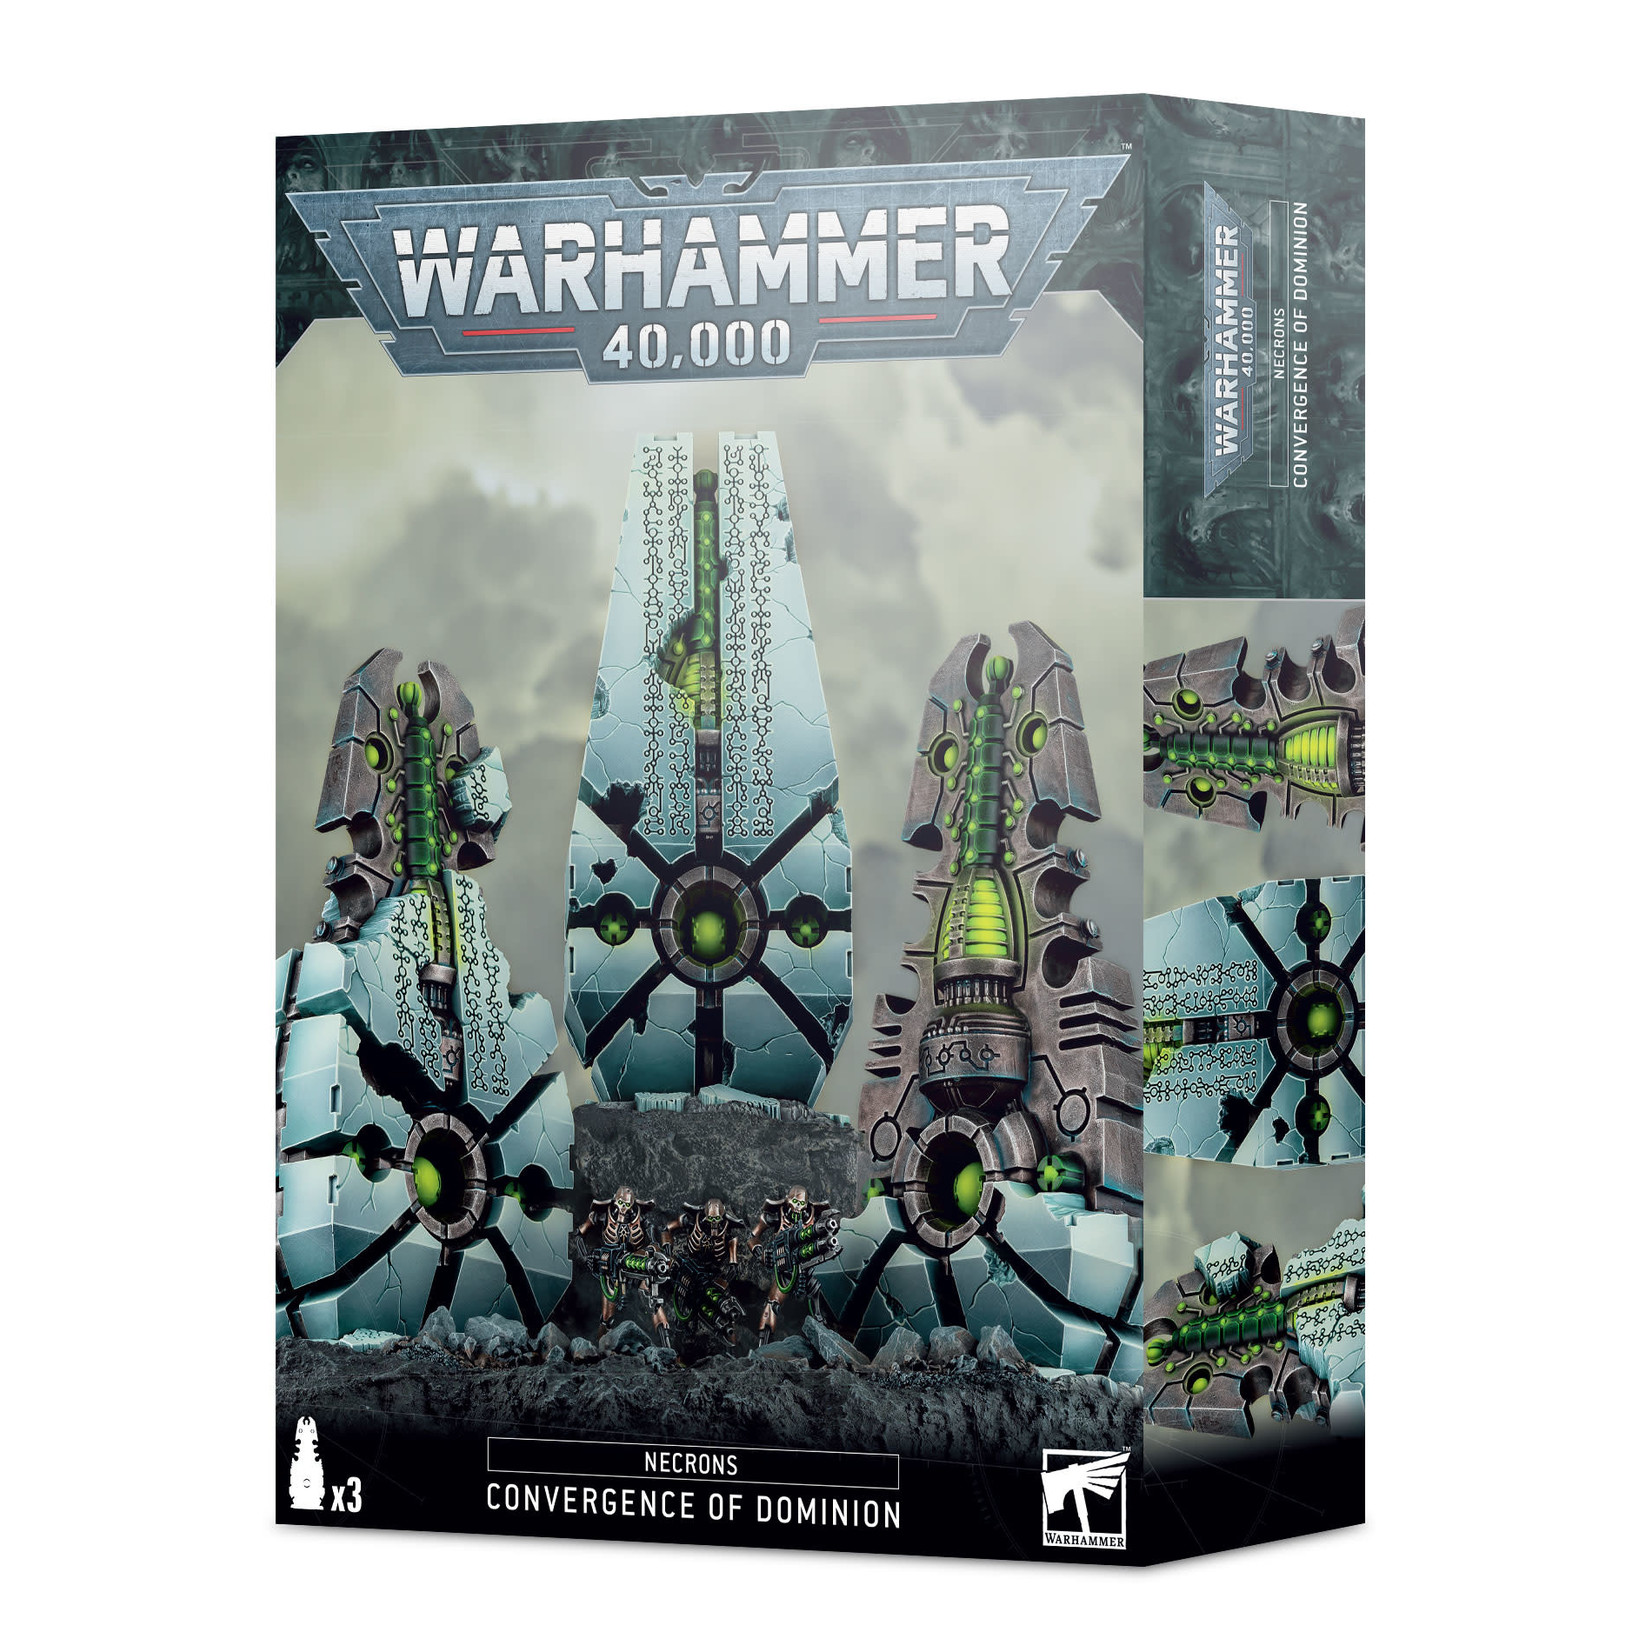 Warhammer 40K Convergence of Dominion